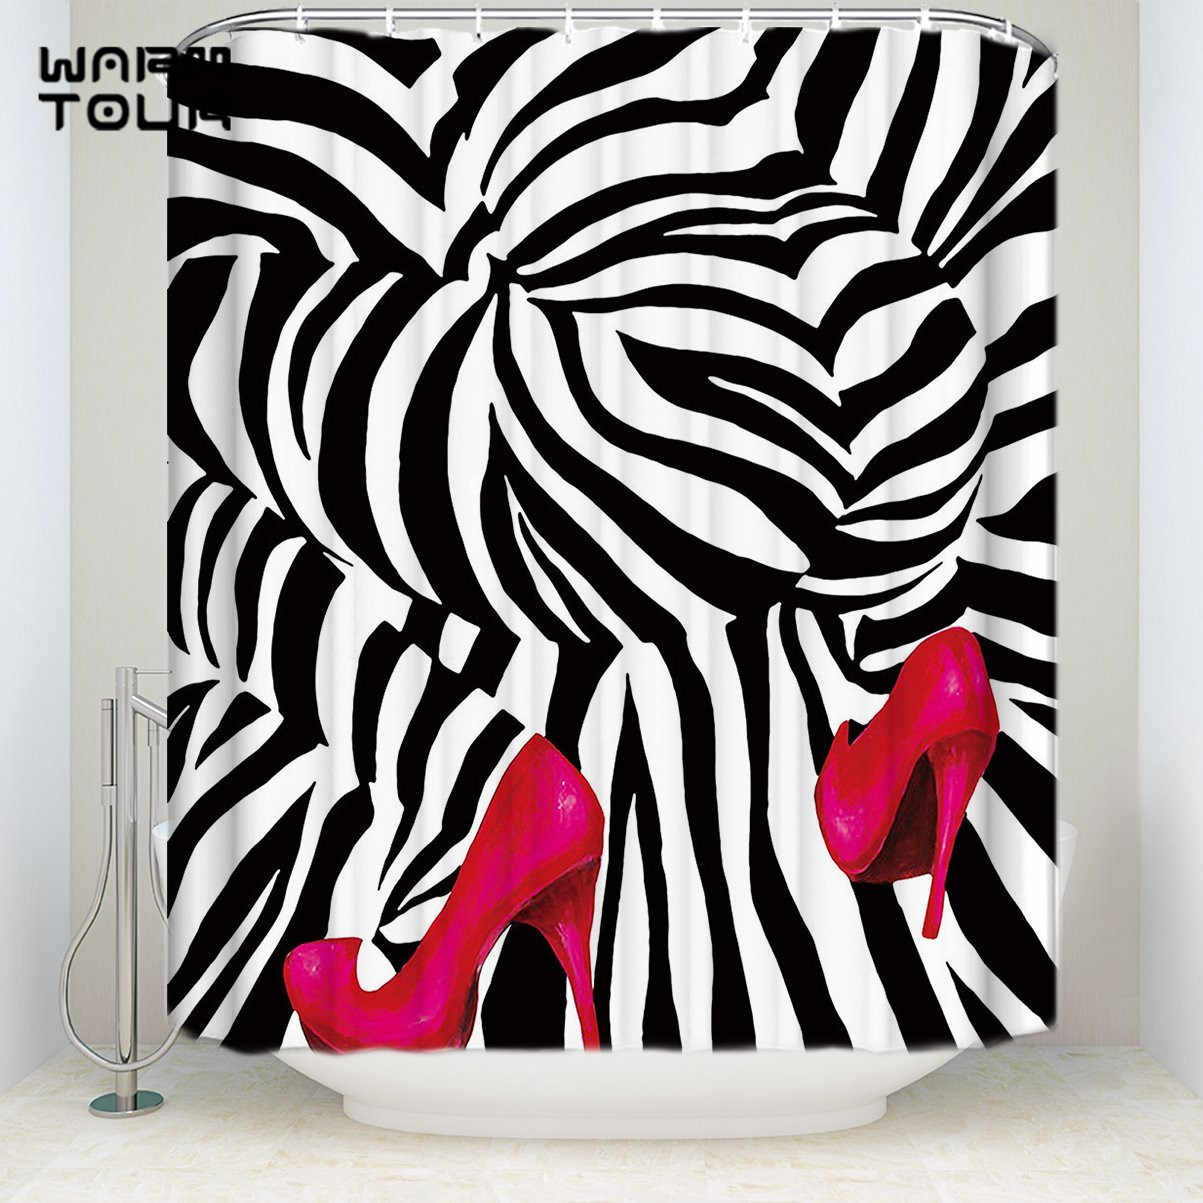 Waterproof Bath Shower Curtains Fashion Zebra Pink High Heels